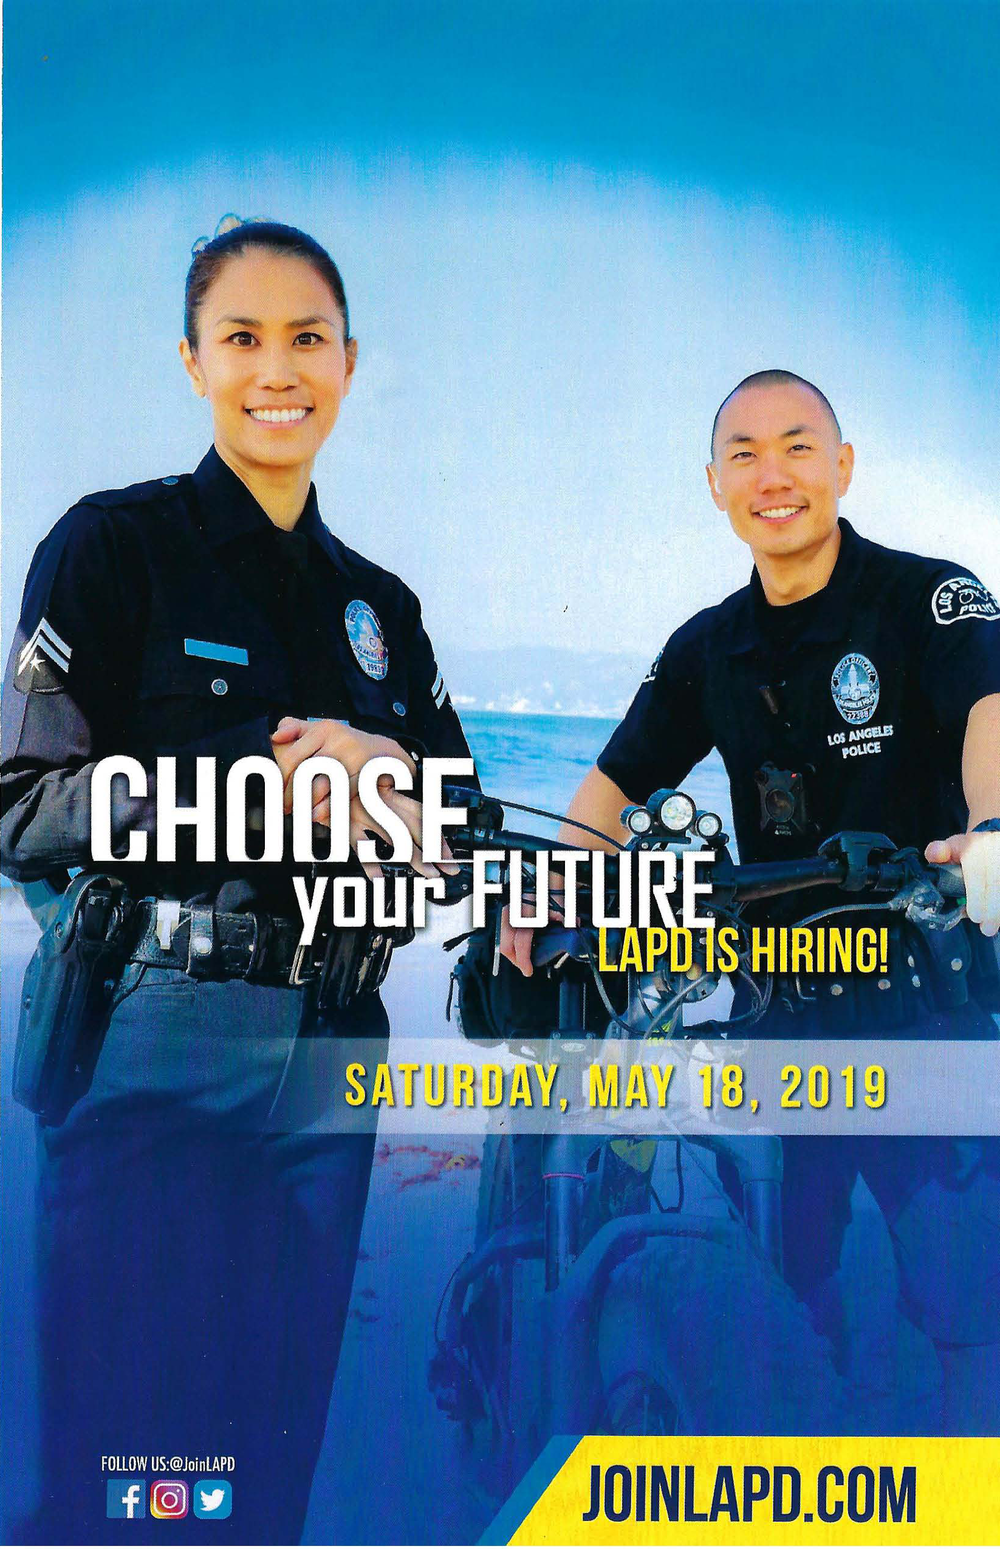 02_LAPD hiring_p1.png